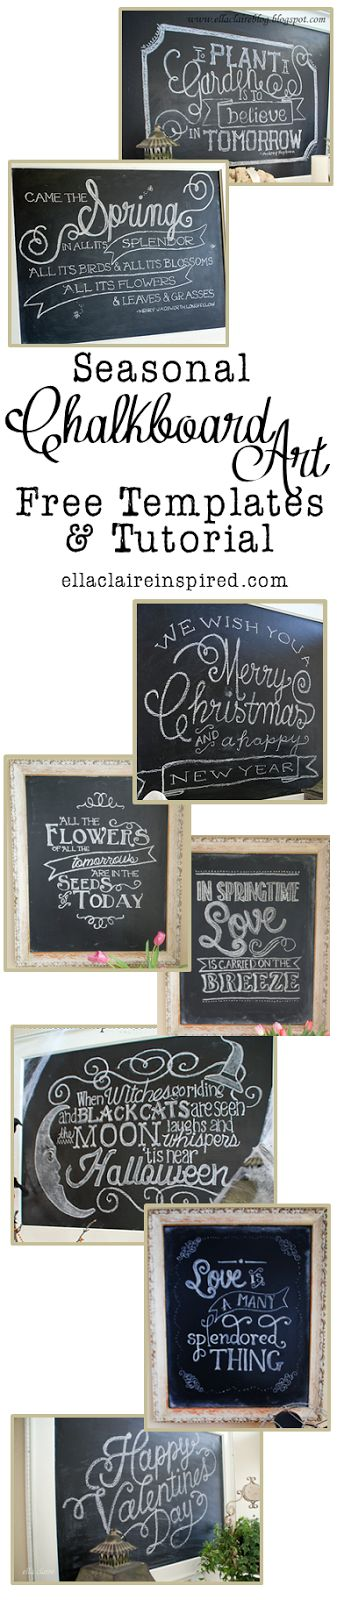 Seasonal Chalkboard Art with Free Templates and Tutorial!